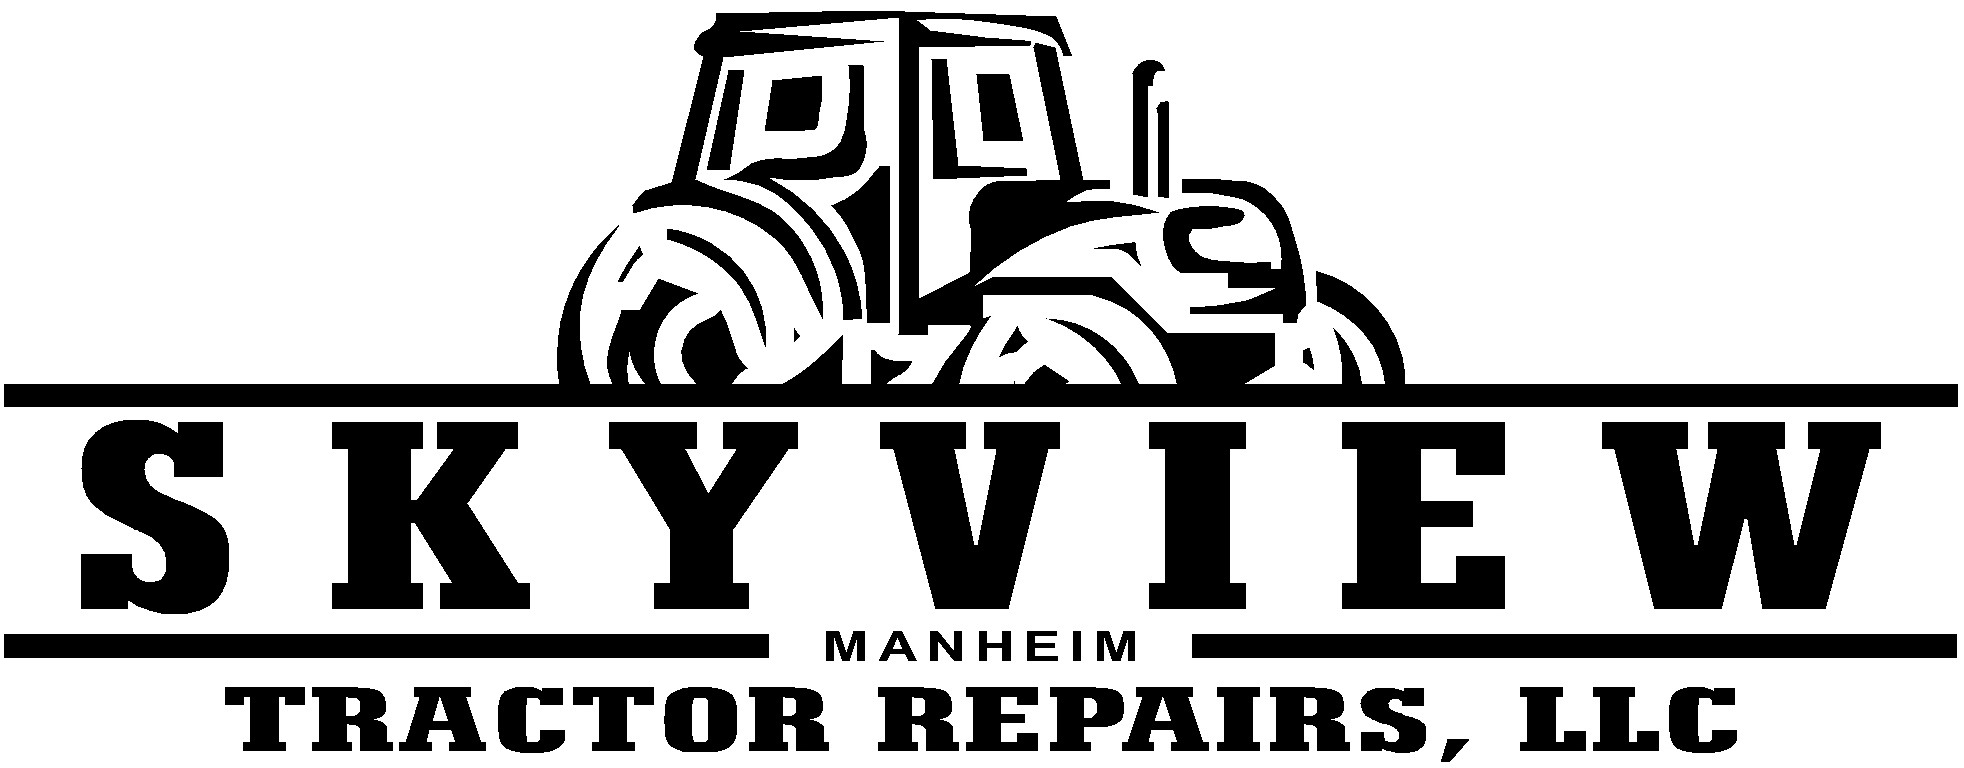 Skyview Tractor Repairs LLC company logo